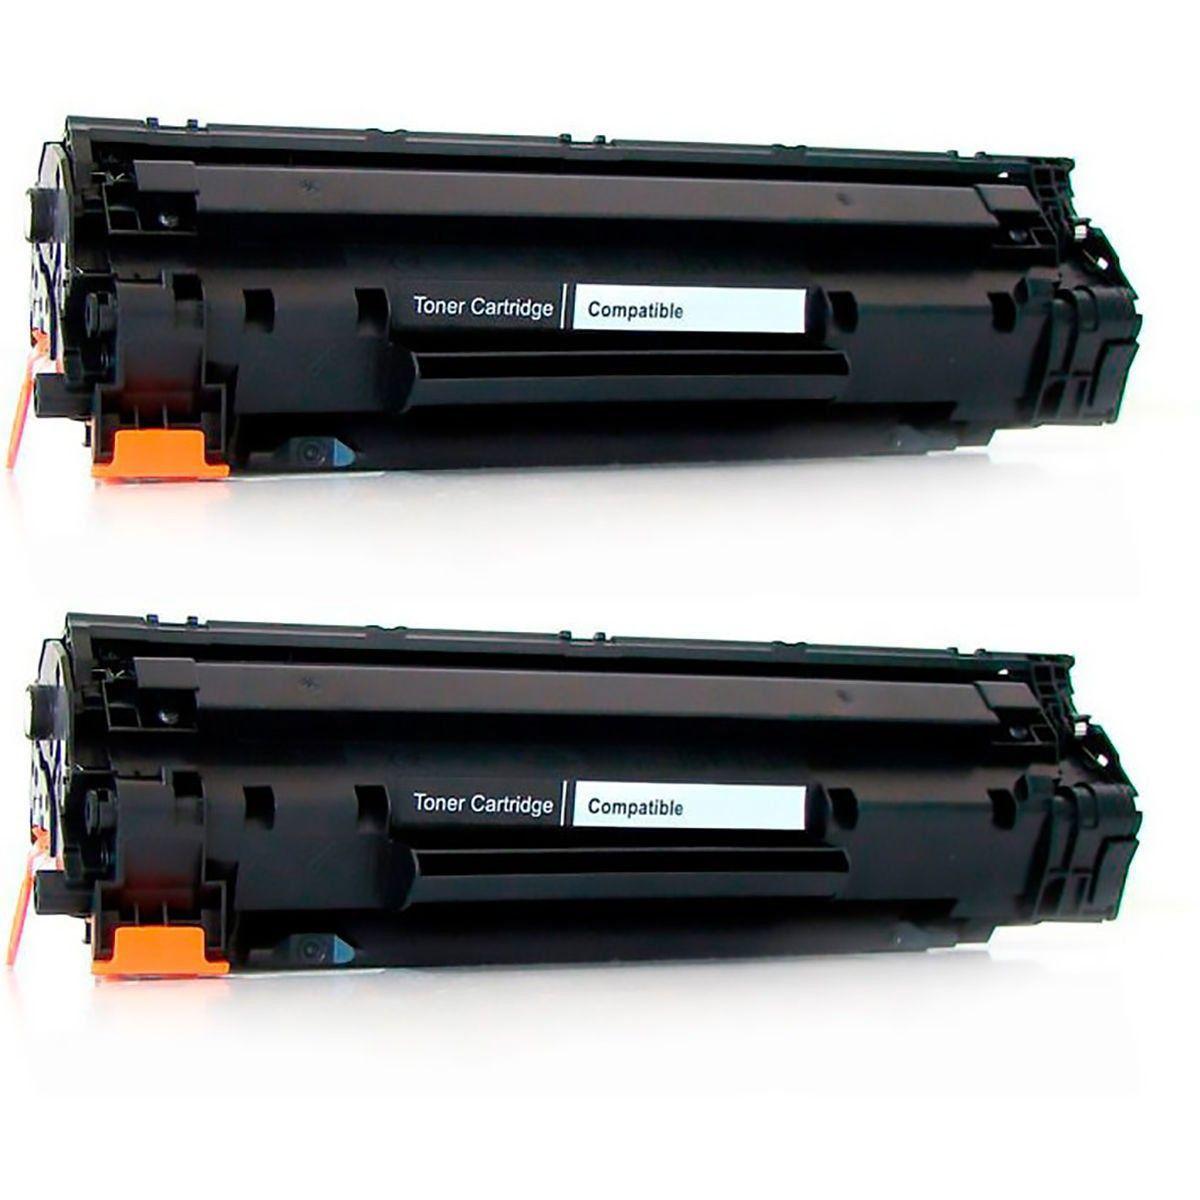 Compatível: Kit 2x Toner 283A 283 para HP M201 M202 M225 M225dw M226 M125a M126a M126nw M127fw M128fn / Preto / 1.500